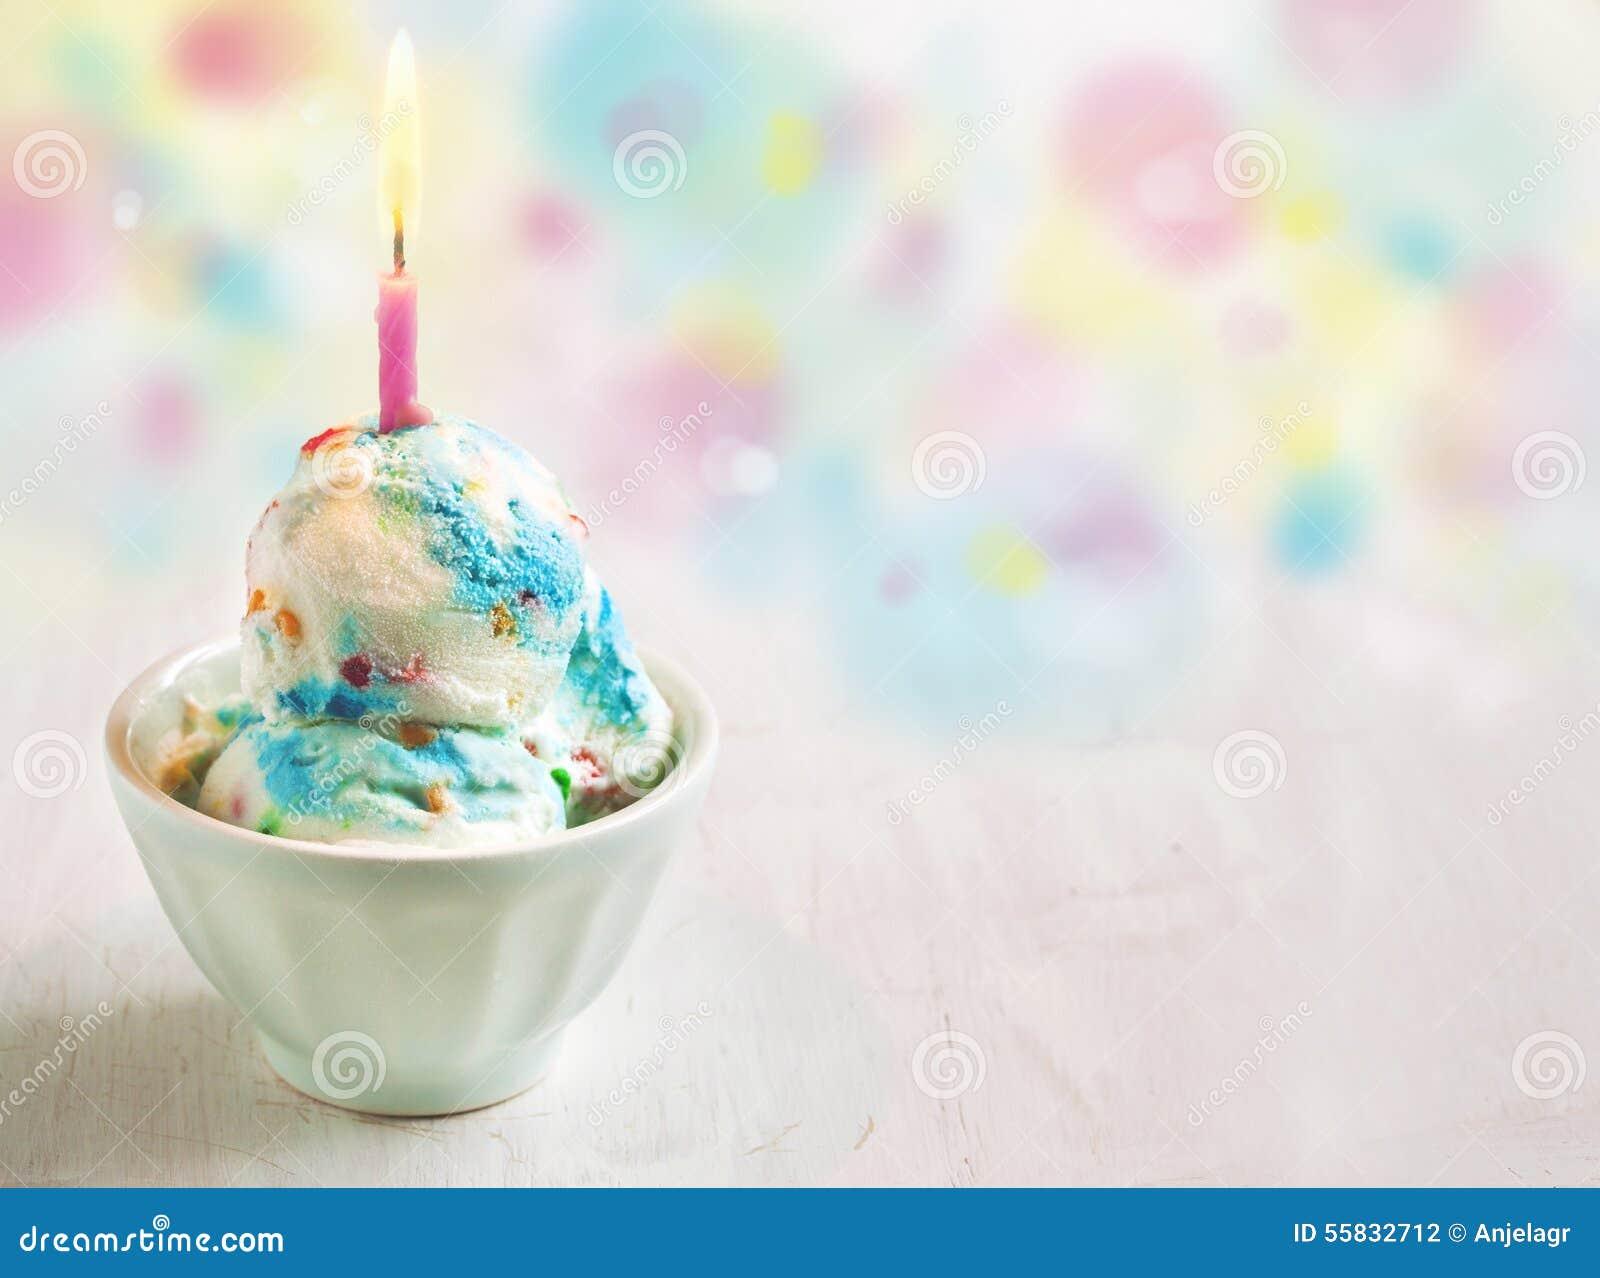 Pleasing Birthday Cake Ice Cream Decorated With Candle Stock Photo Image Personalised Birthday Cards Veneteletsinfo